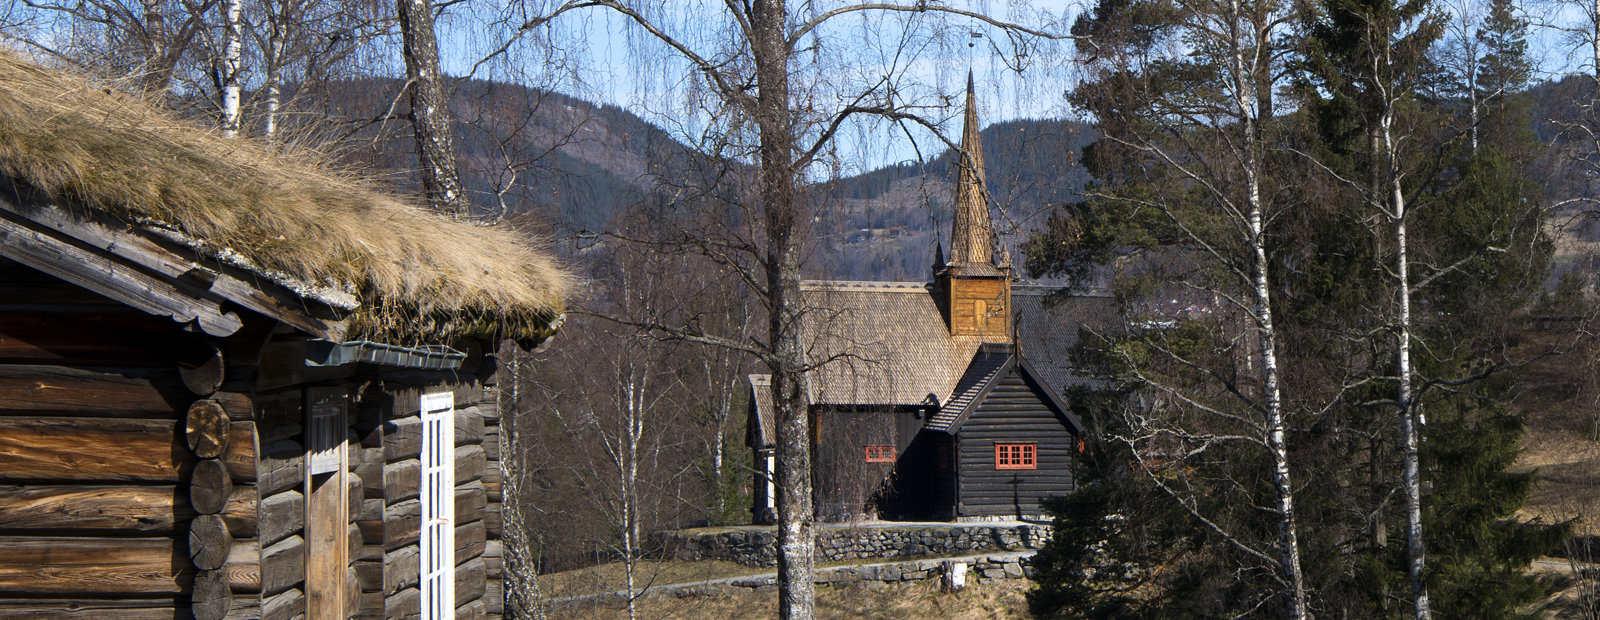 Garmo stavkirke med den gamle skolestua i forgrunnen på friluftsmuseet Maihaugen i Lillehammer.